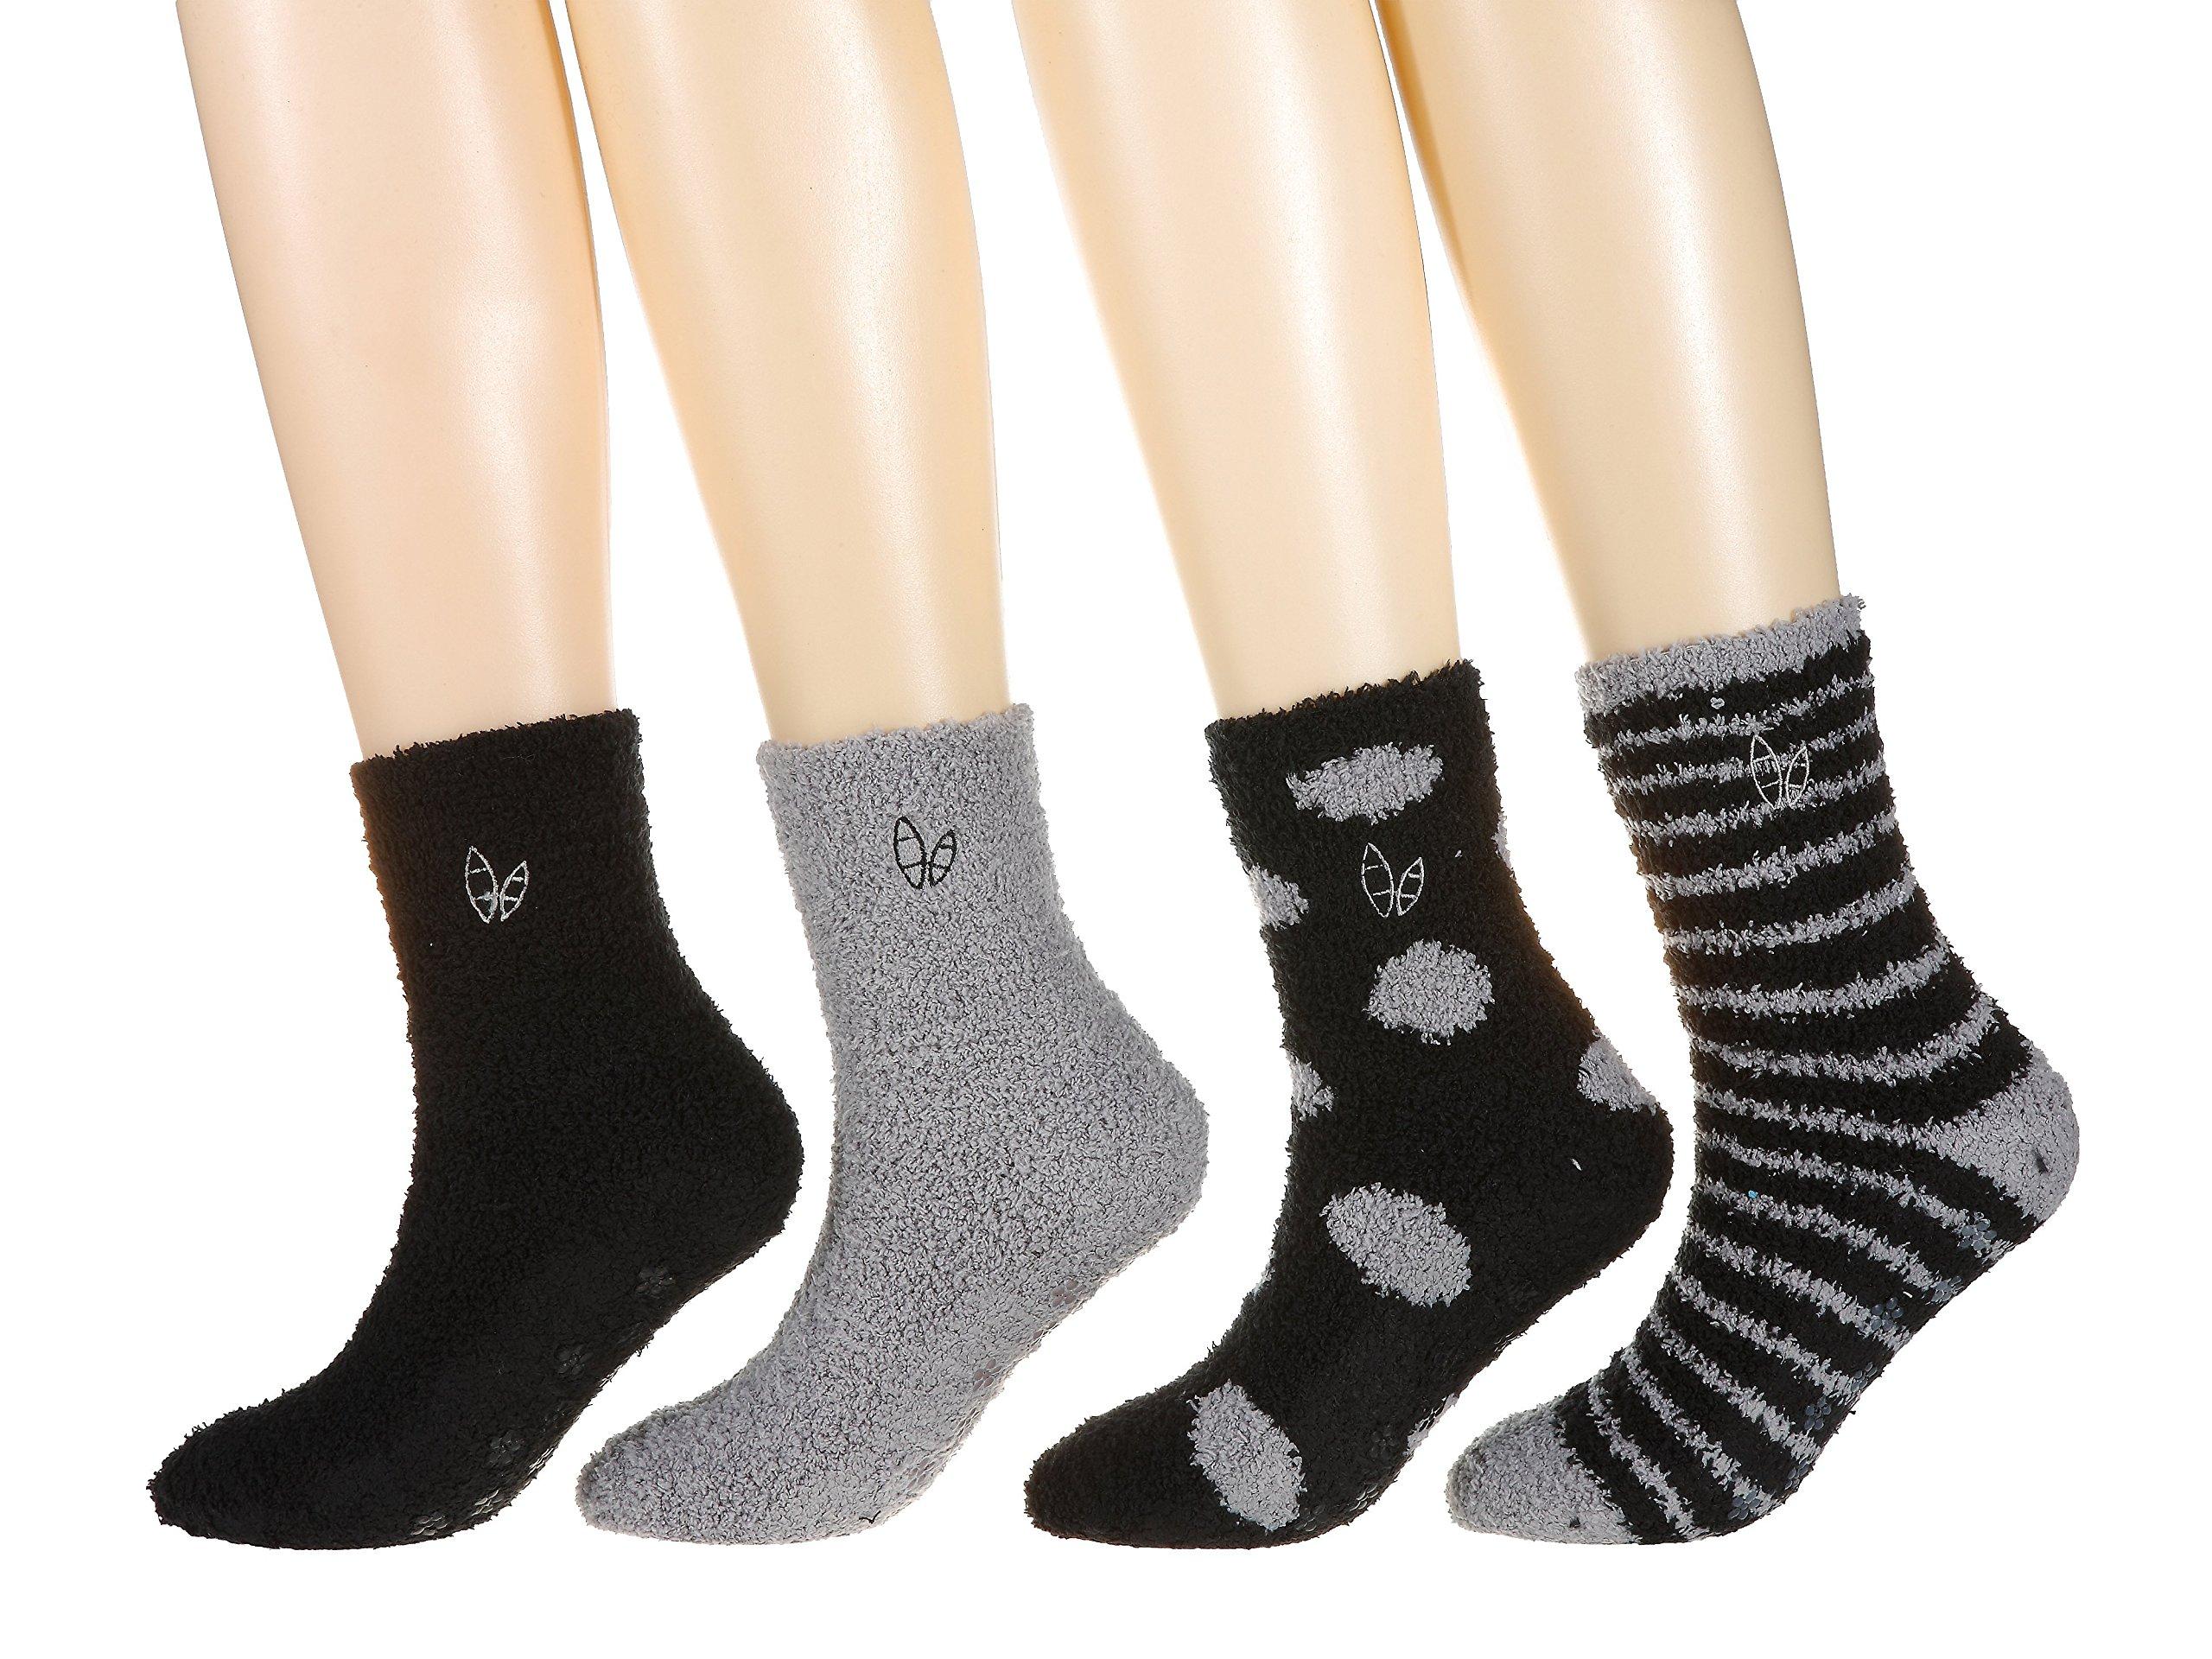 4-Pairs Womens Twin Boat Soft Anti-Skid Fuzzy Winter Socks, Set A10, 9-11